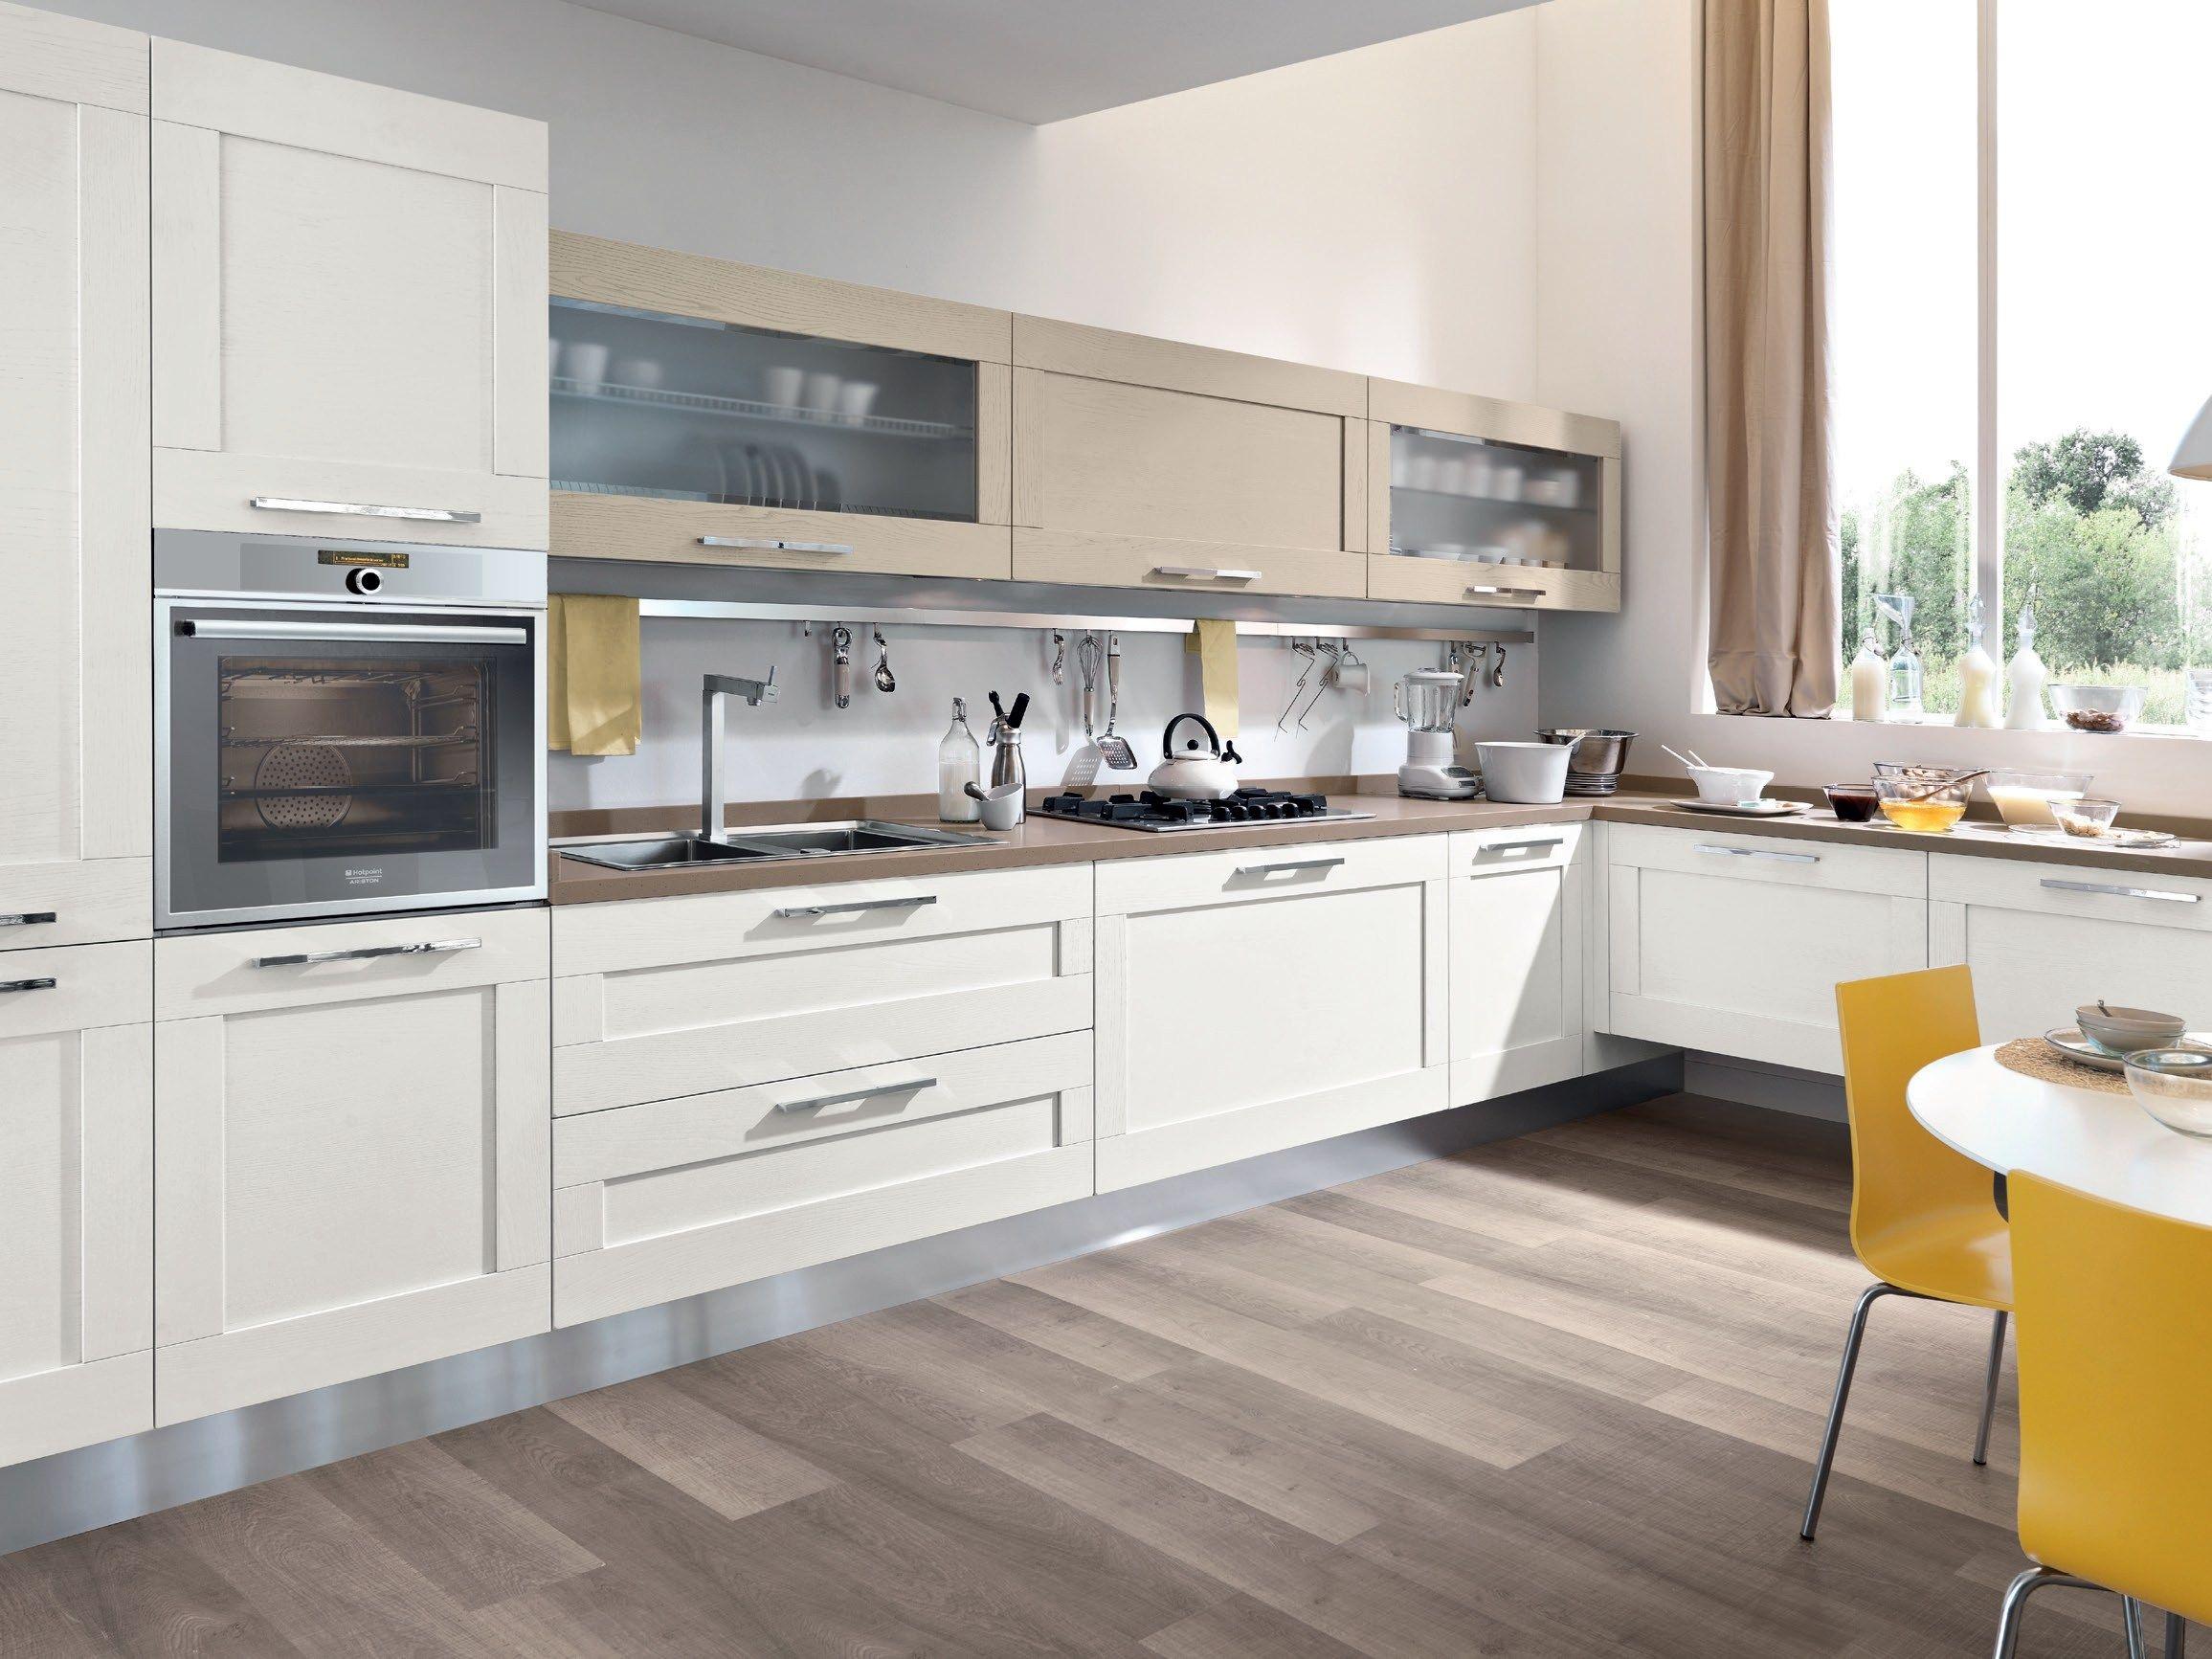 GALLERY | Ash kitchen By Cucine Lube